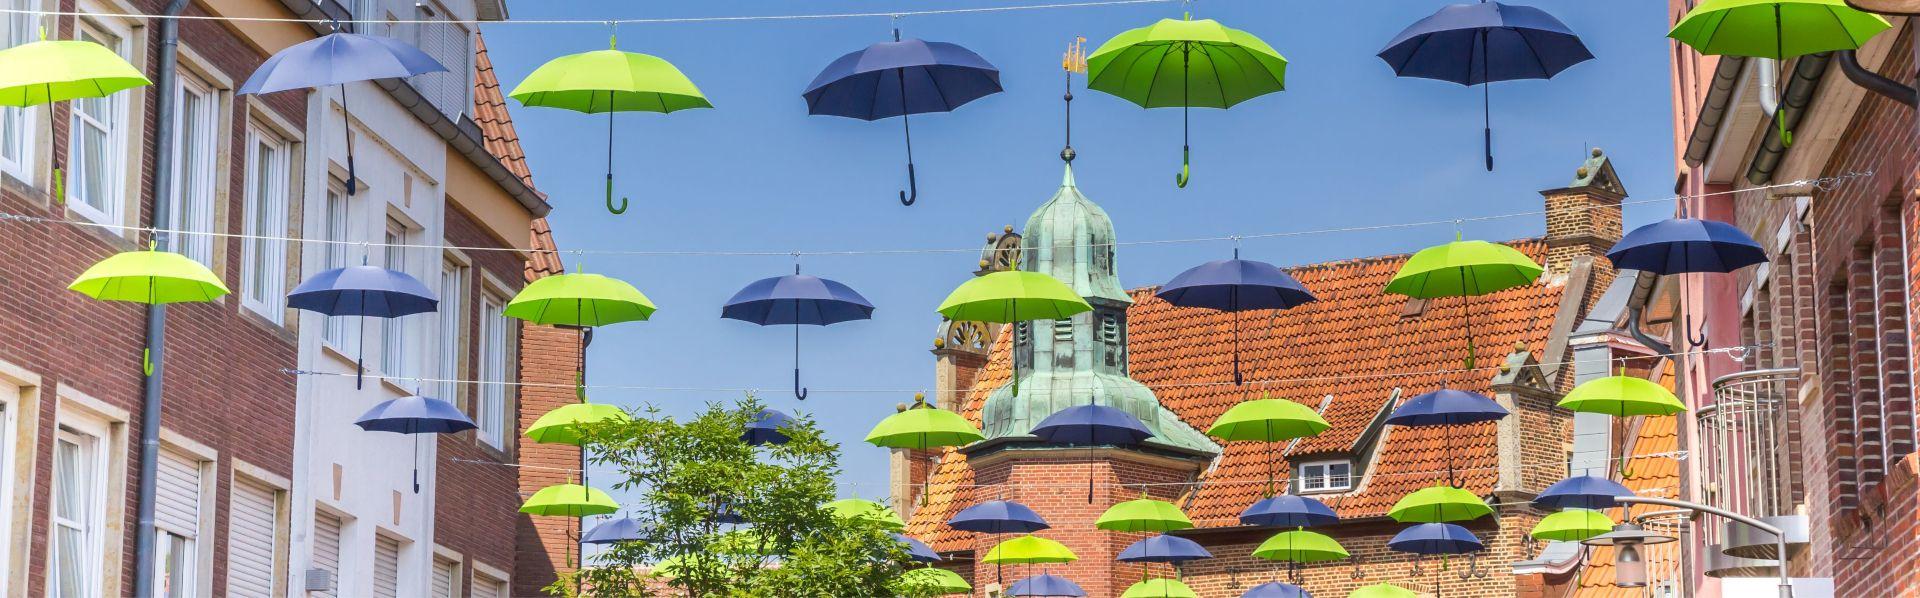 Meppener Sommer - Regenschirme